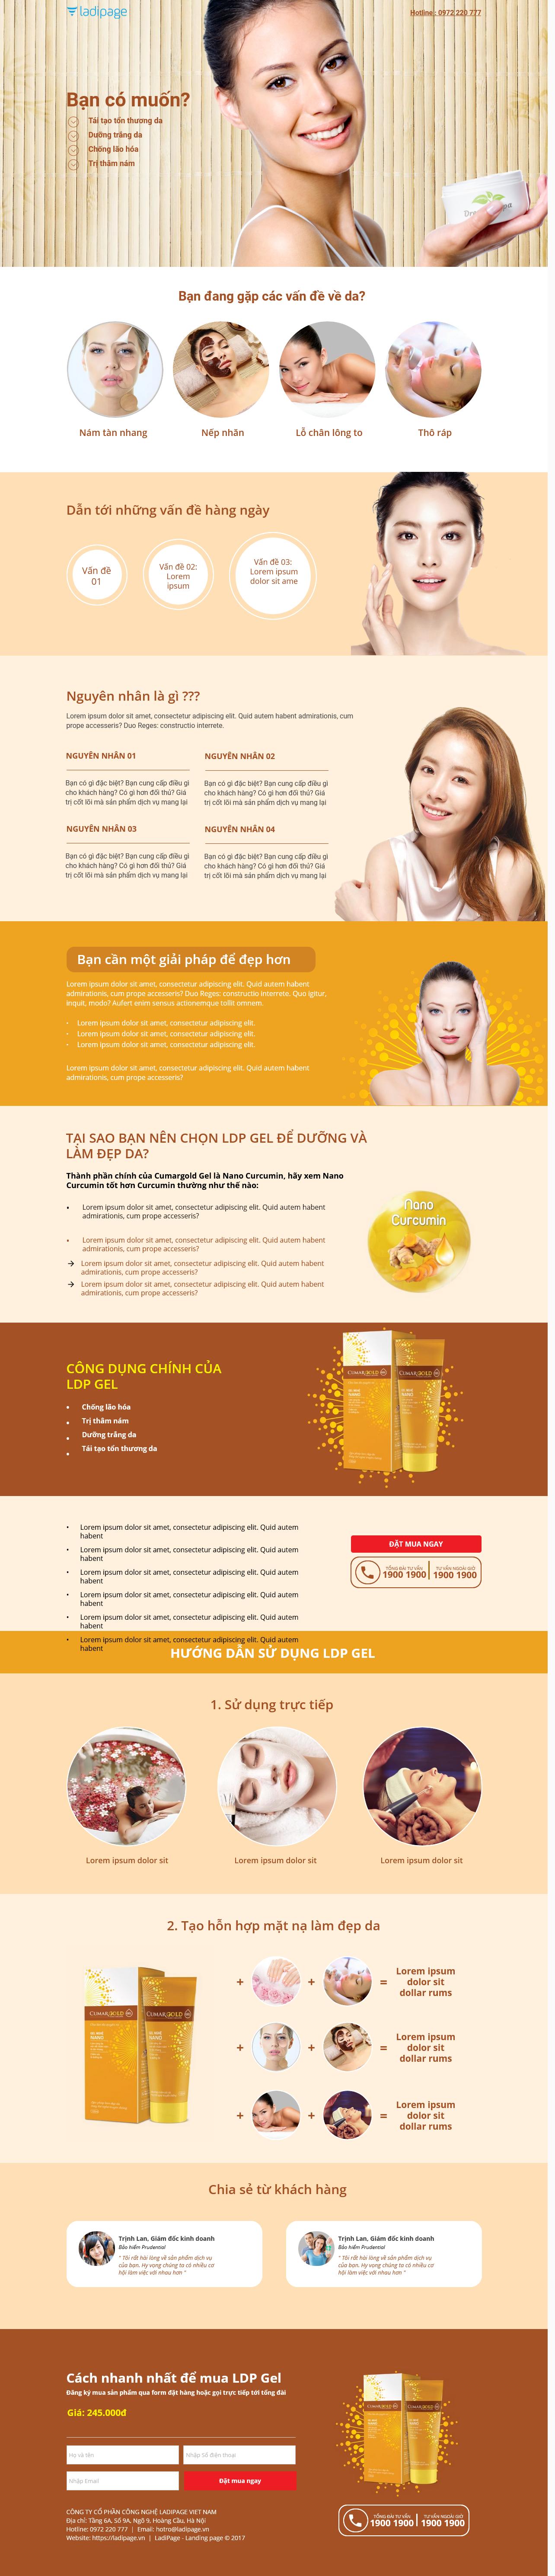 Thiết kế website Thiết kế webiste landingpage tham-my---spa---lam-dep Sức Khỏe Làm đẹp 17